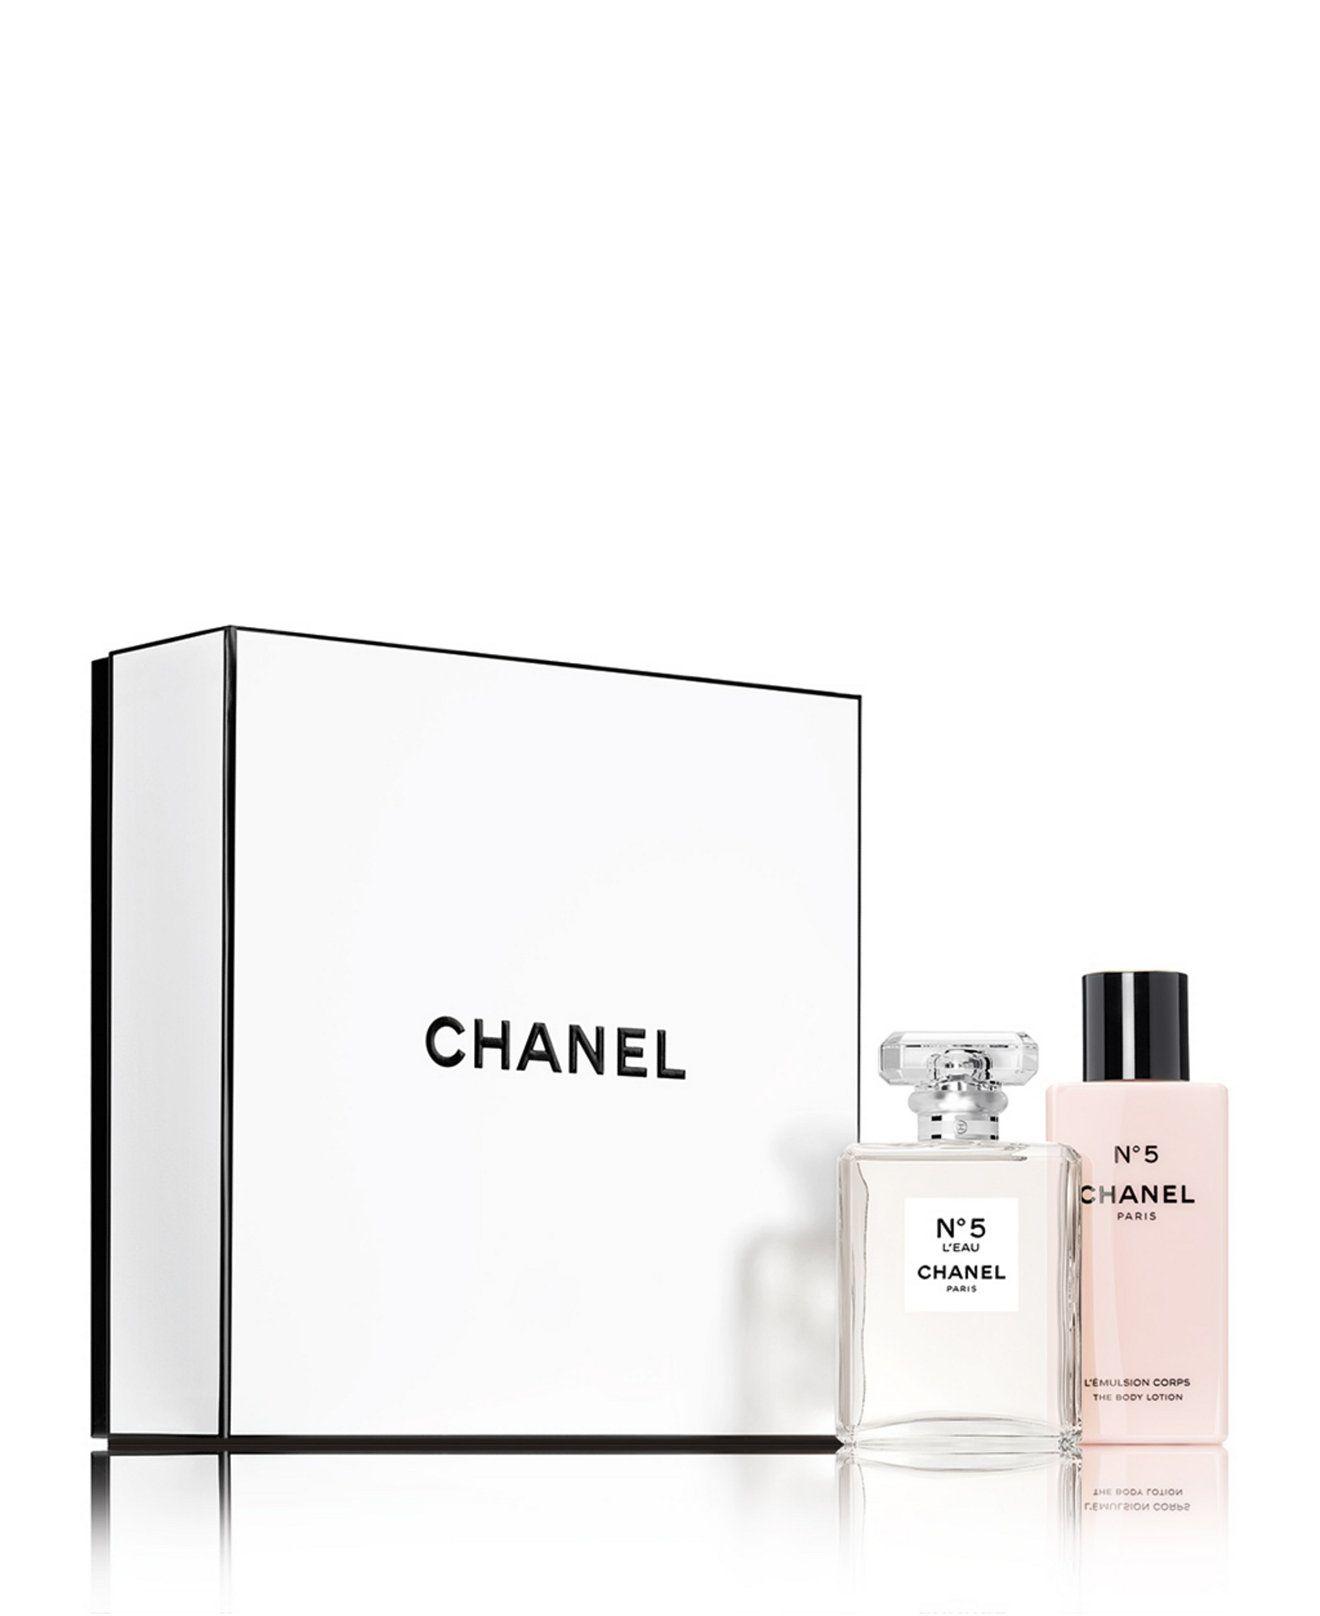 3f5cc52191c CHANEL N°5 L EAU Duo 2-Pc. Gift Set - N°5 - Beauty - Macy s ...